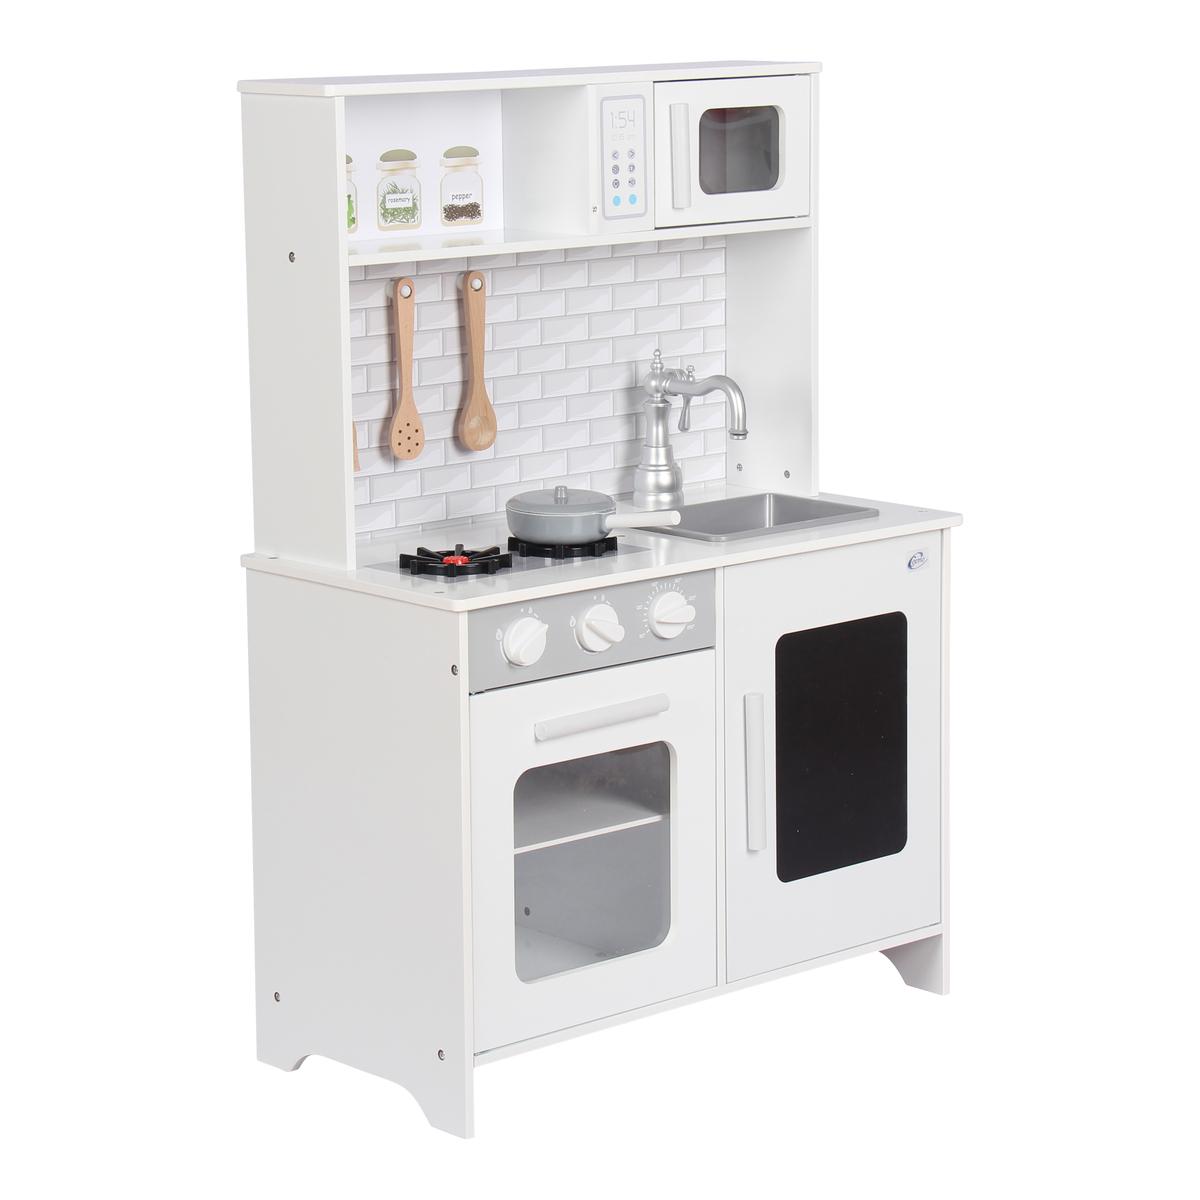 Bild 3 von Coemo Kinderküche Lea